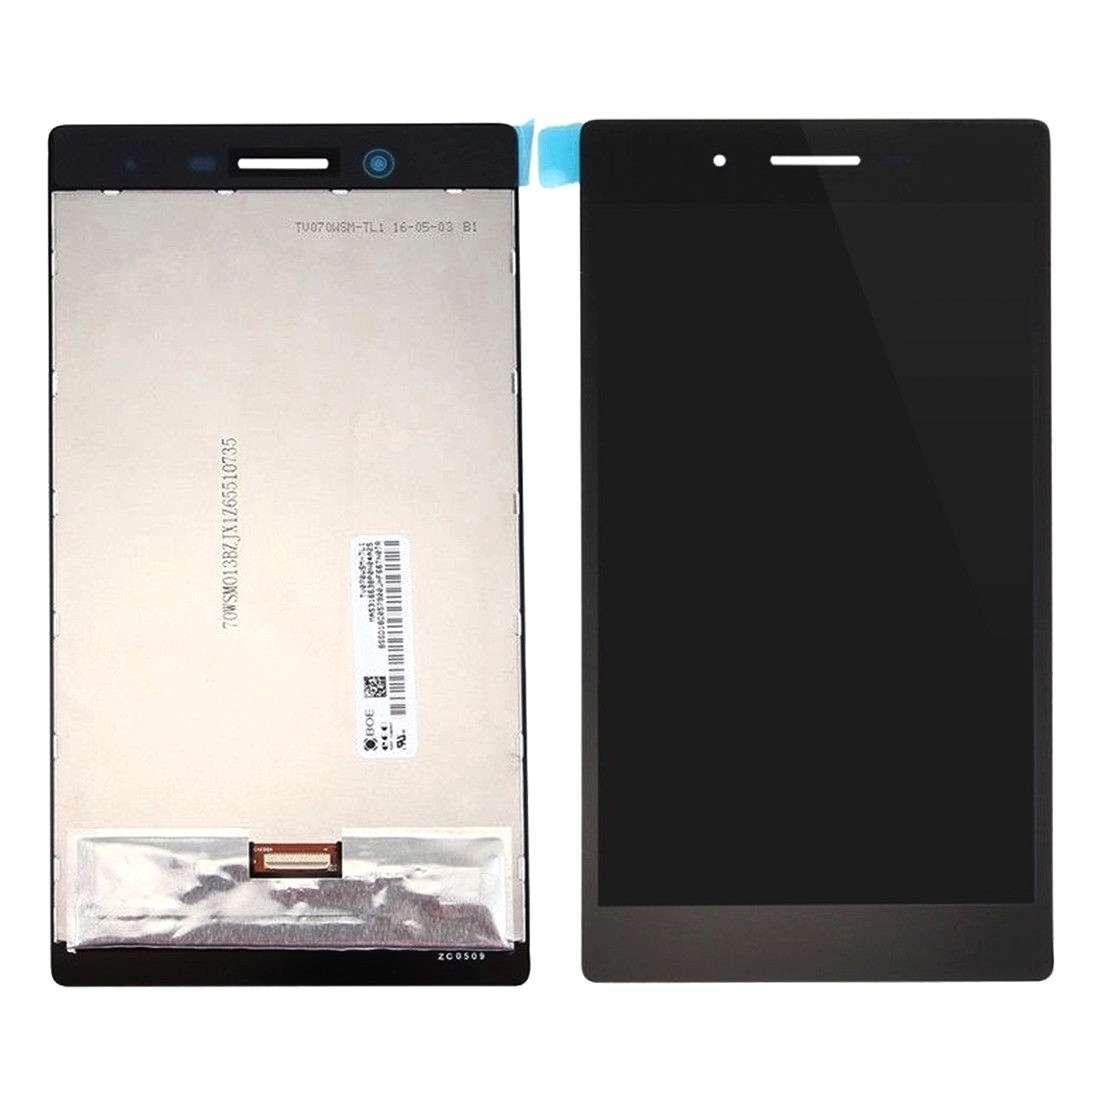 Ansamblu LCD Display Touchscreen Lenovo Tab 3 TB3 730M imagine powerlaptop.ro 2021